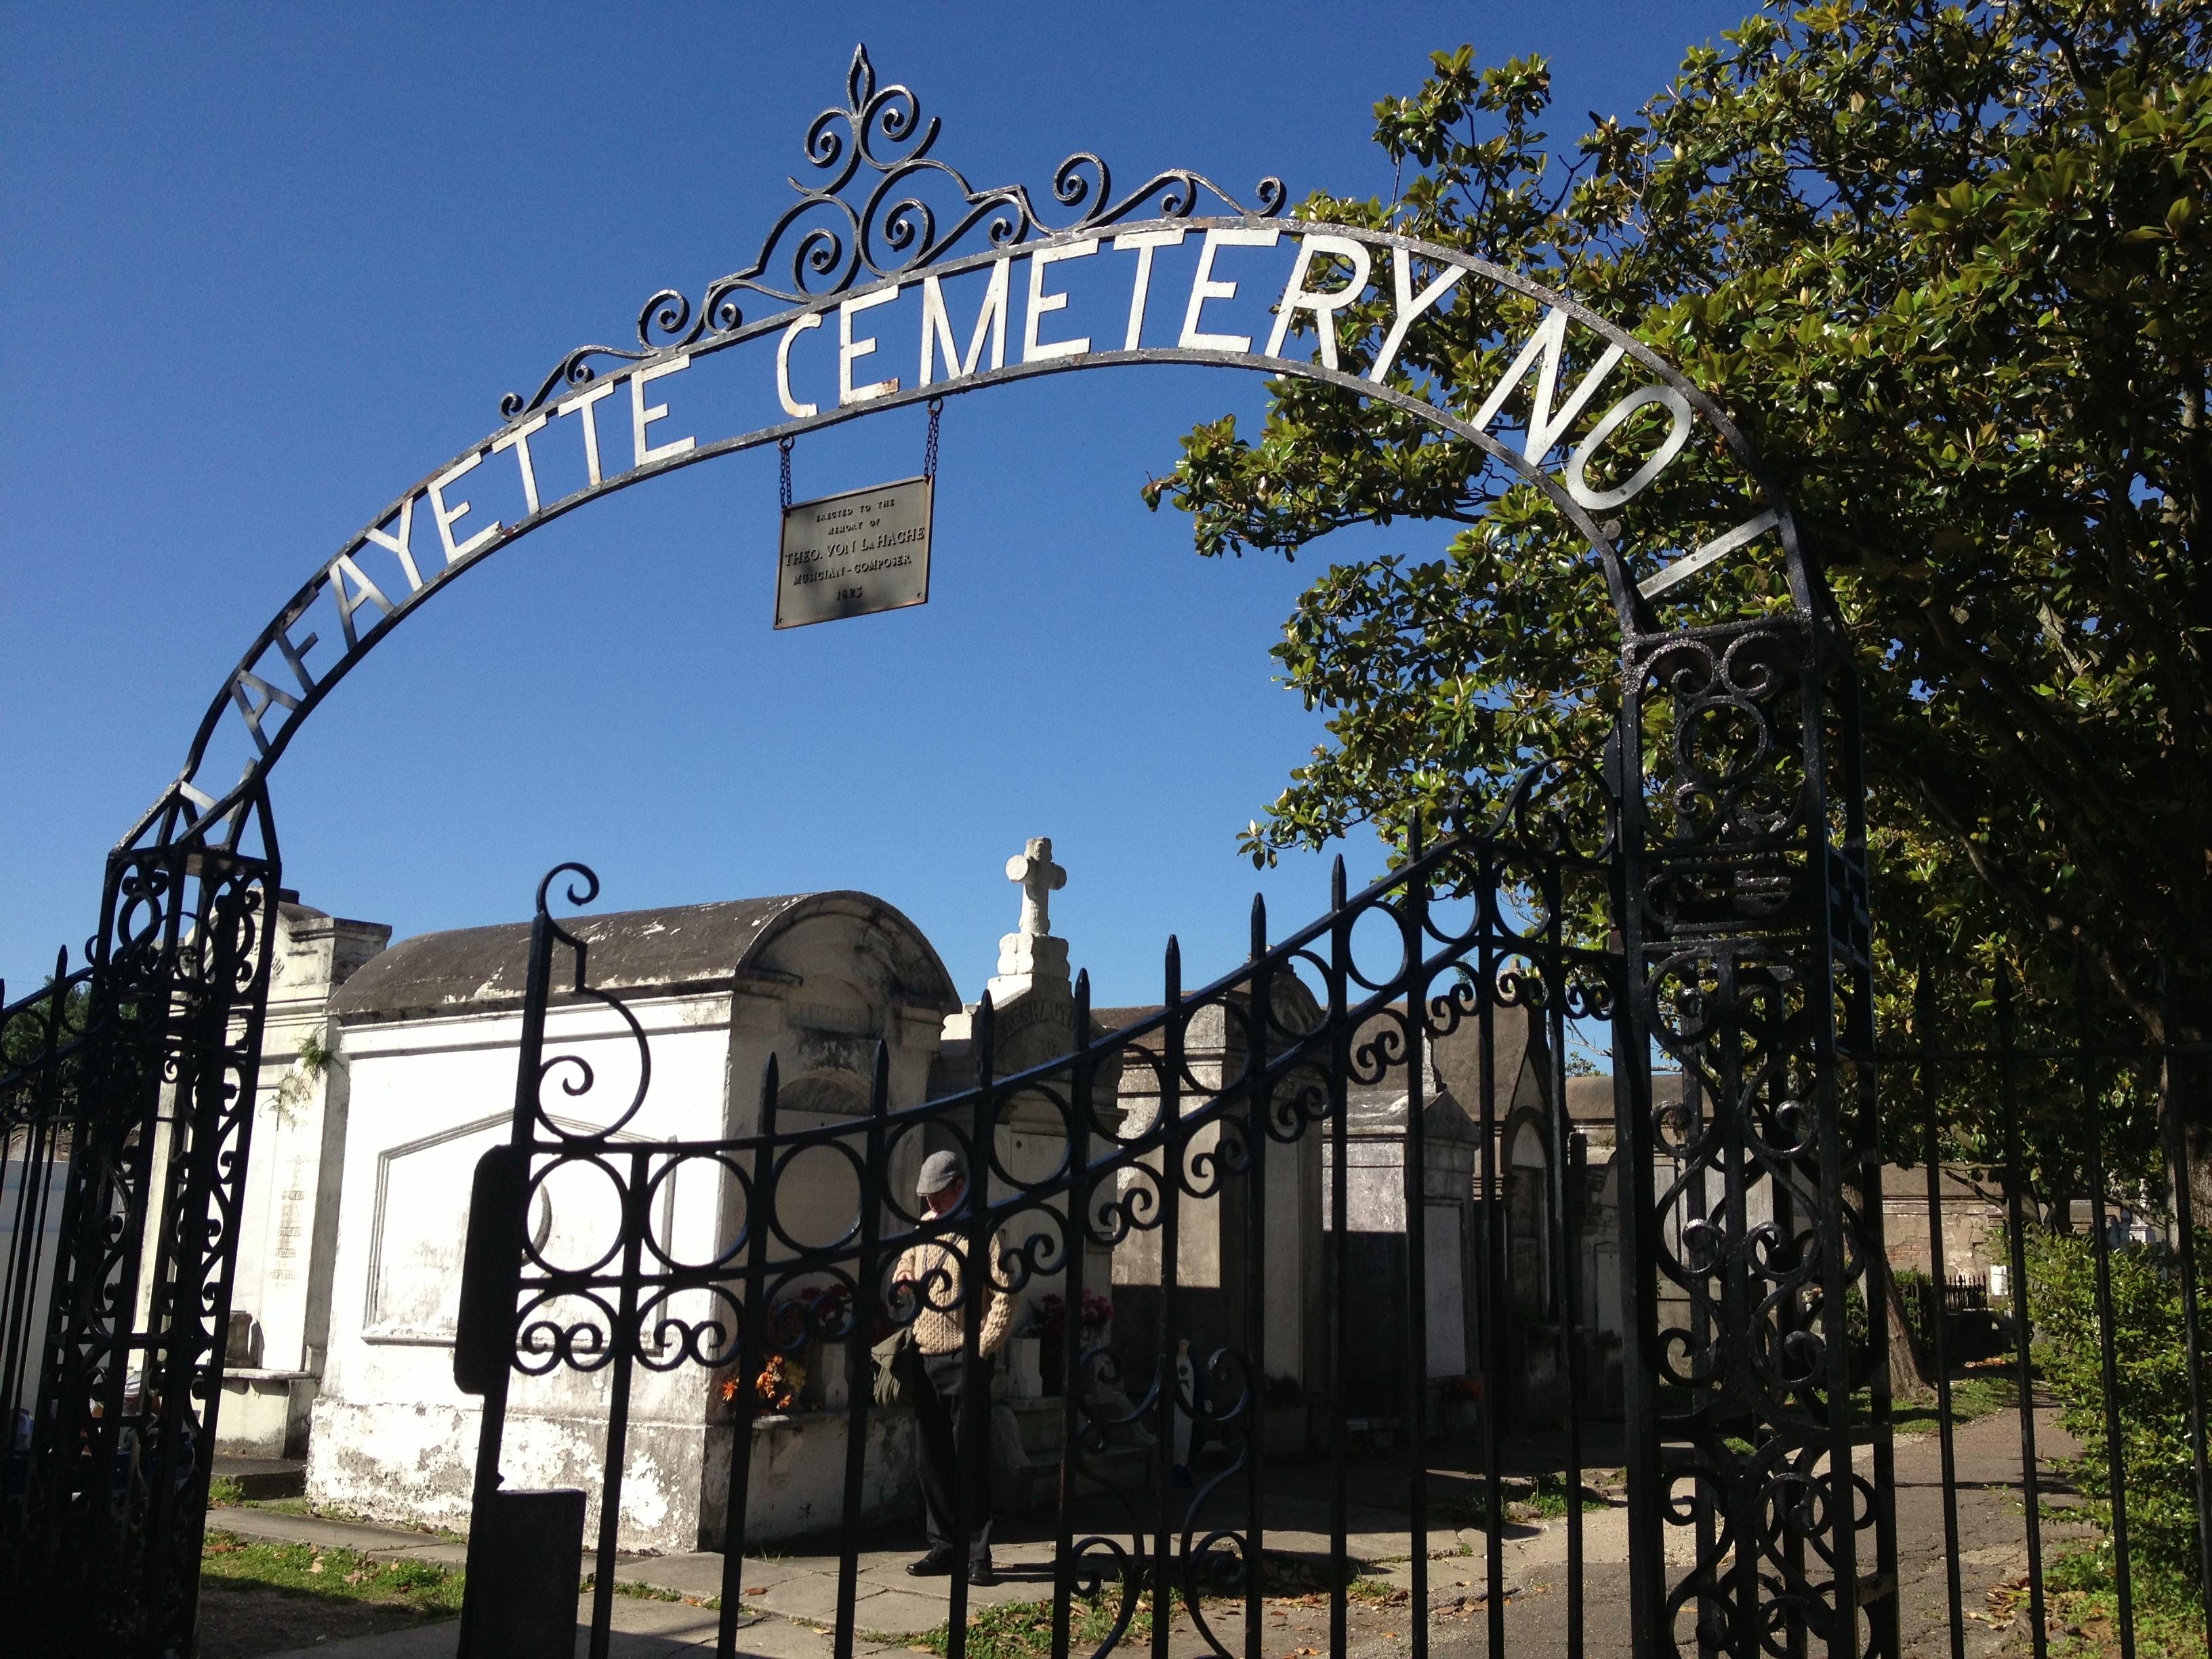 File:Lafayette Cemetery No 1.jpg - Wikimedia Commons